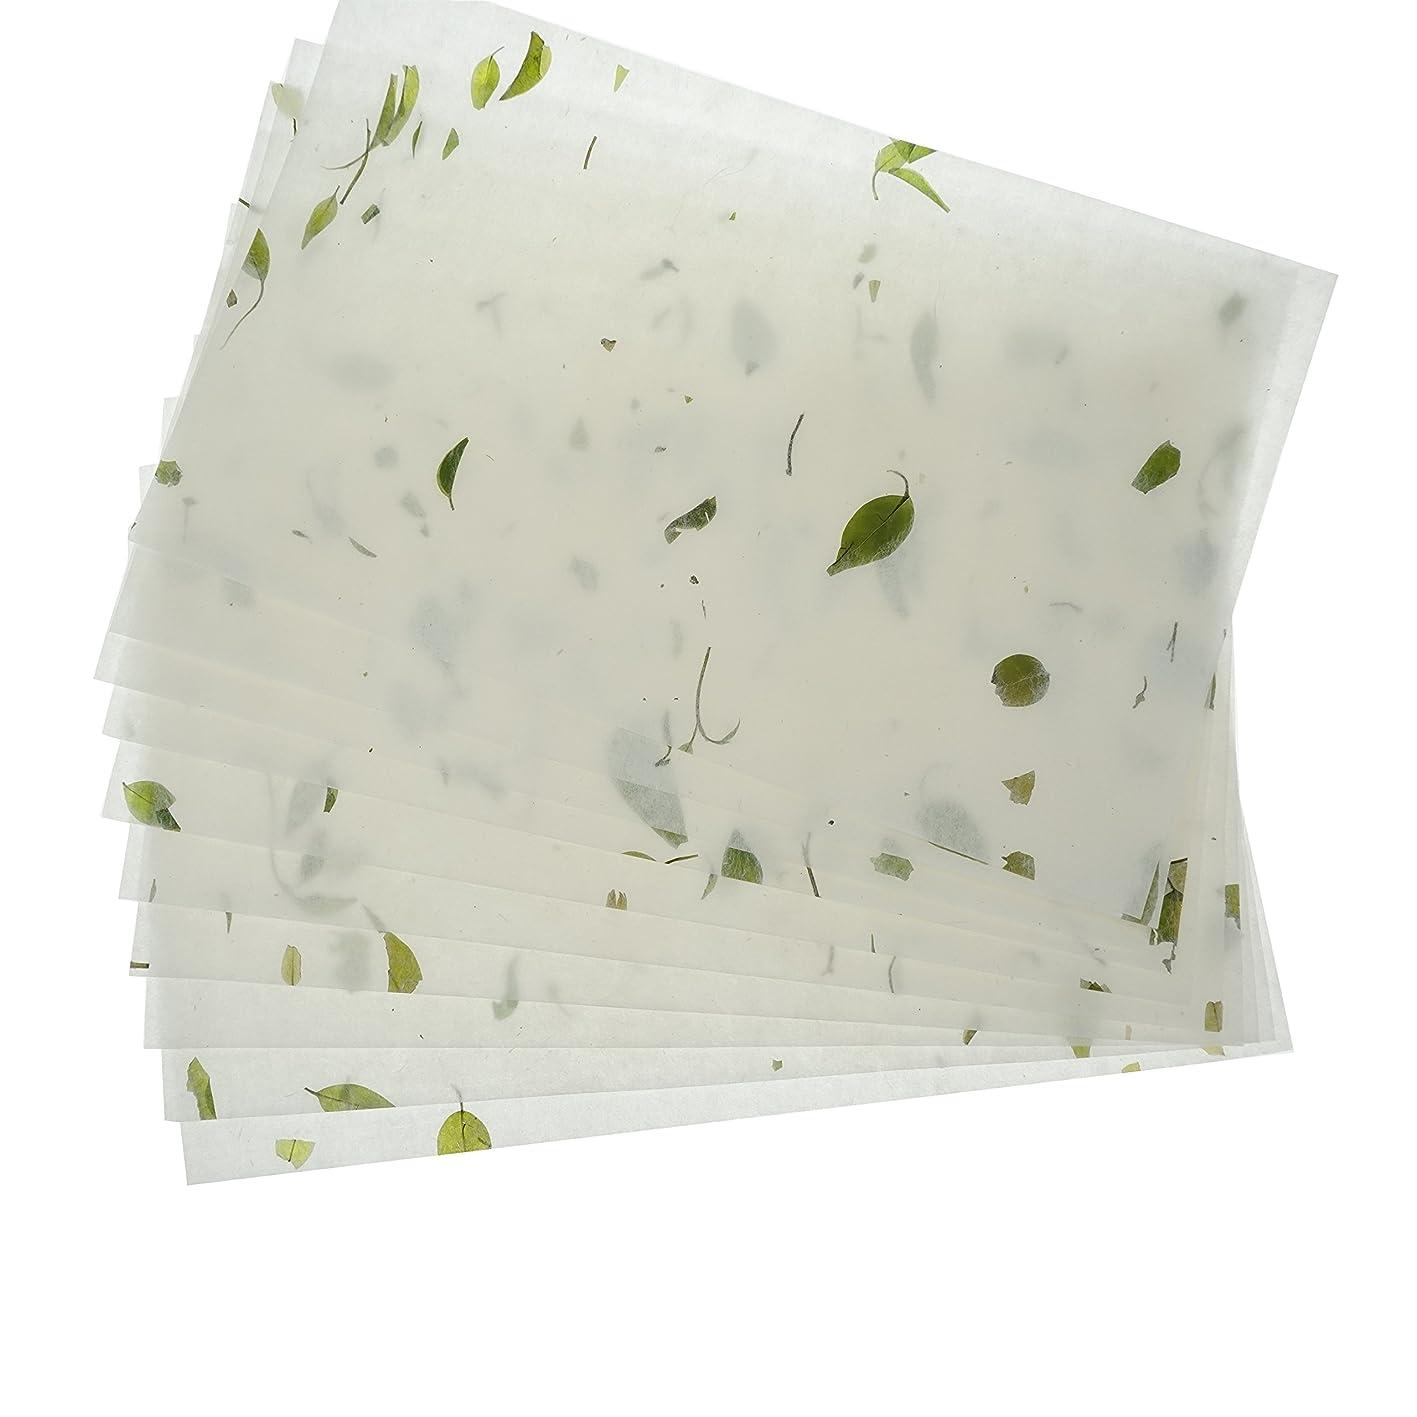 Bilipala Natural Plant Handmade Xuan Paper Rice Paper Letter Paper Writing Paper xwapvrafrjg031